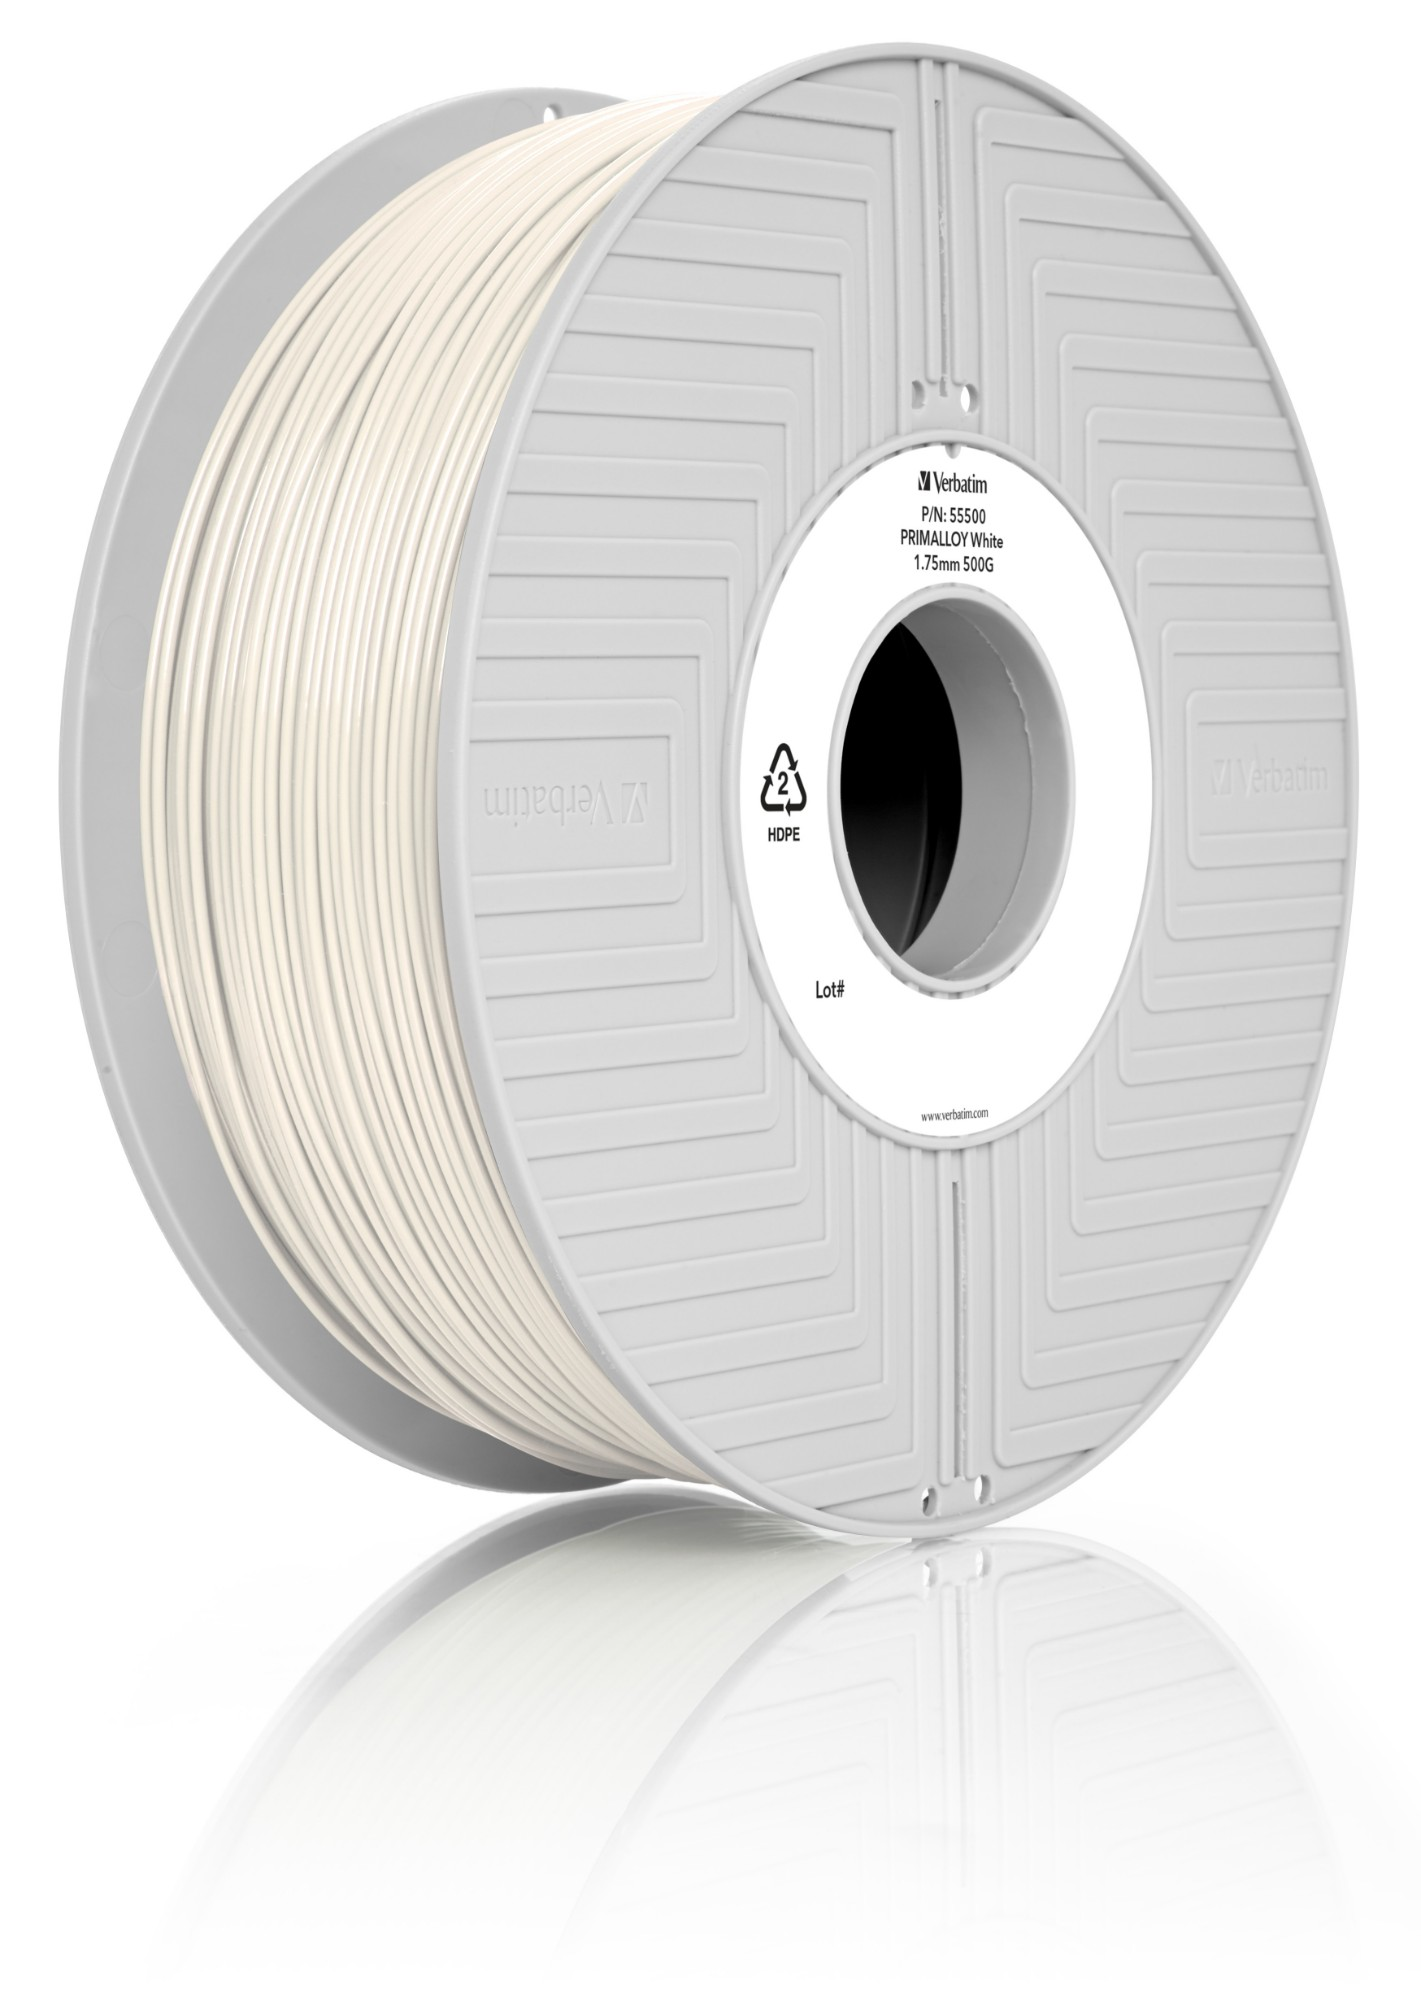 3d Printer Filament Primalloy 1.75mm 500g White